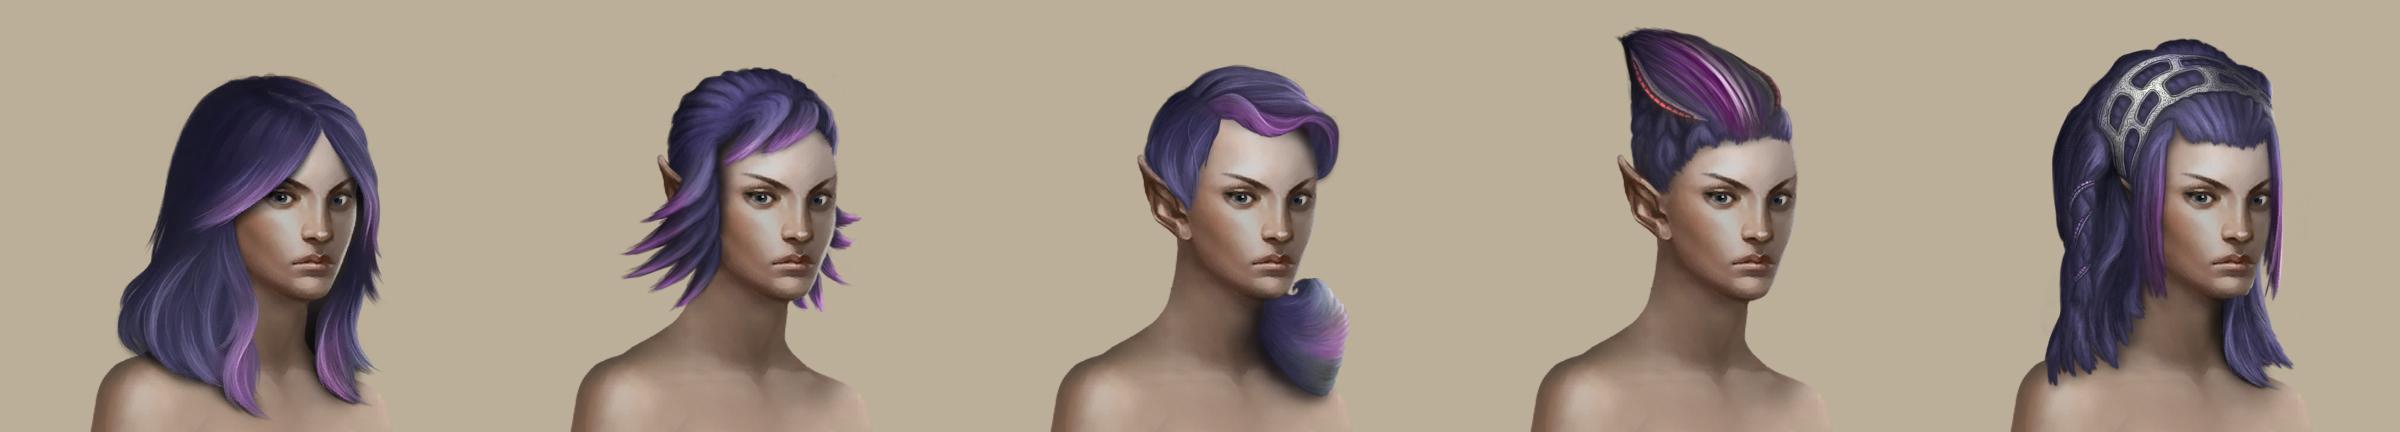 humanoid_05_female_hair_purple_0X.jpg